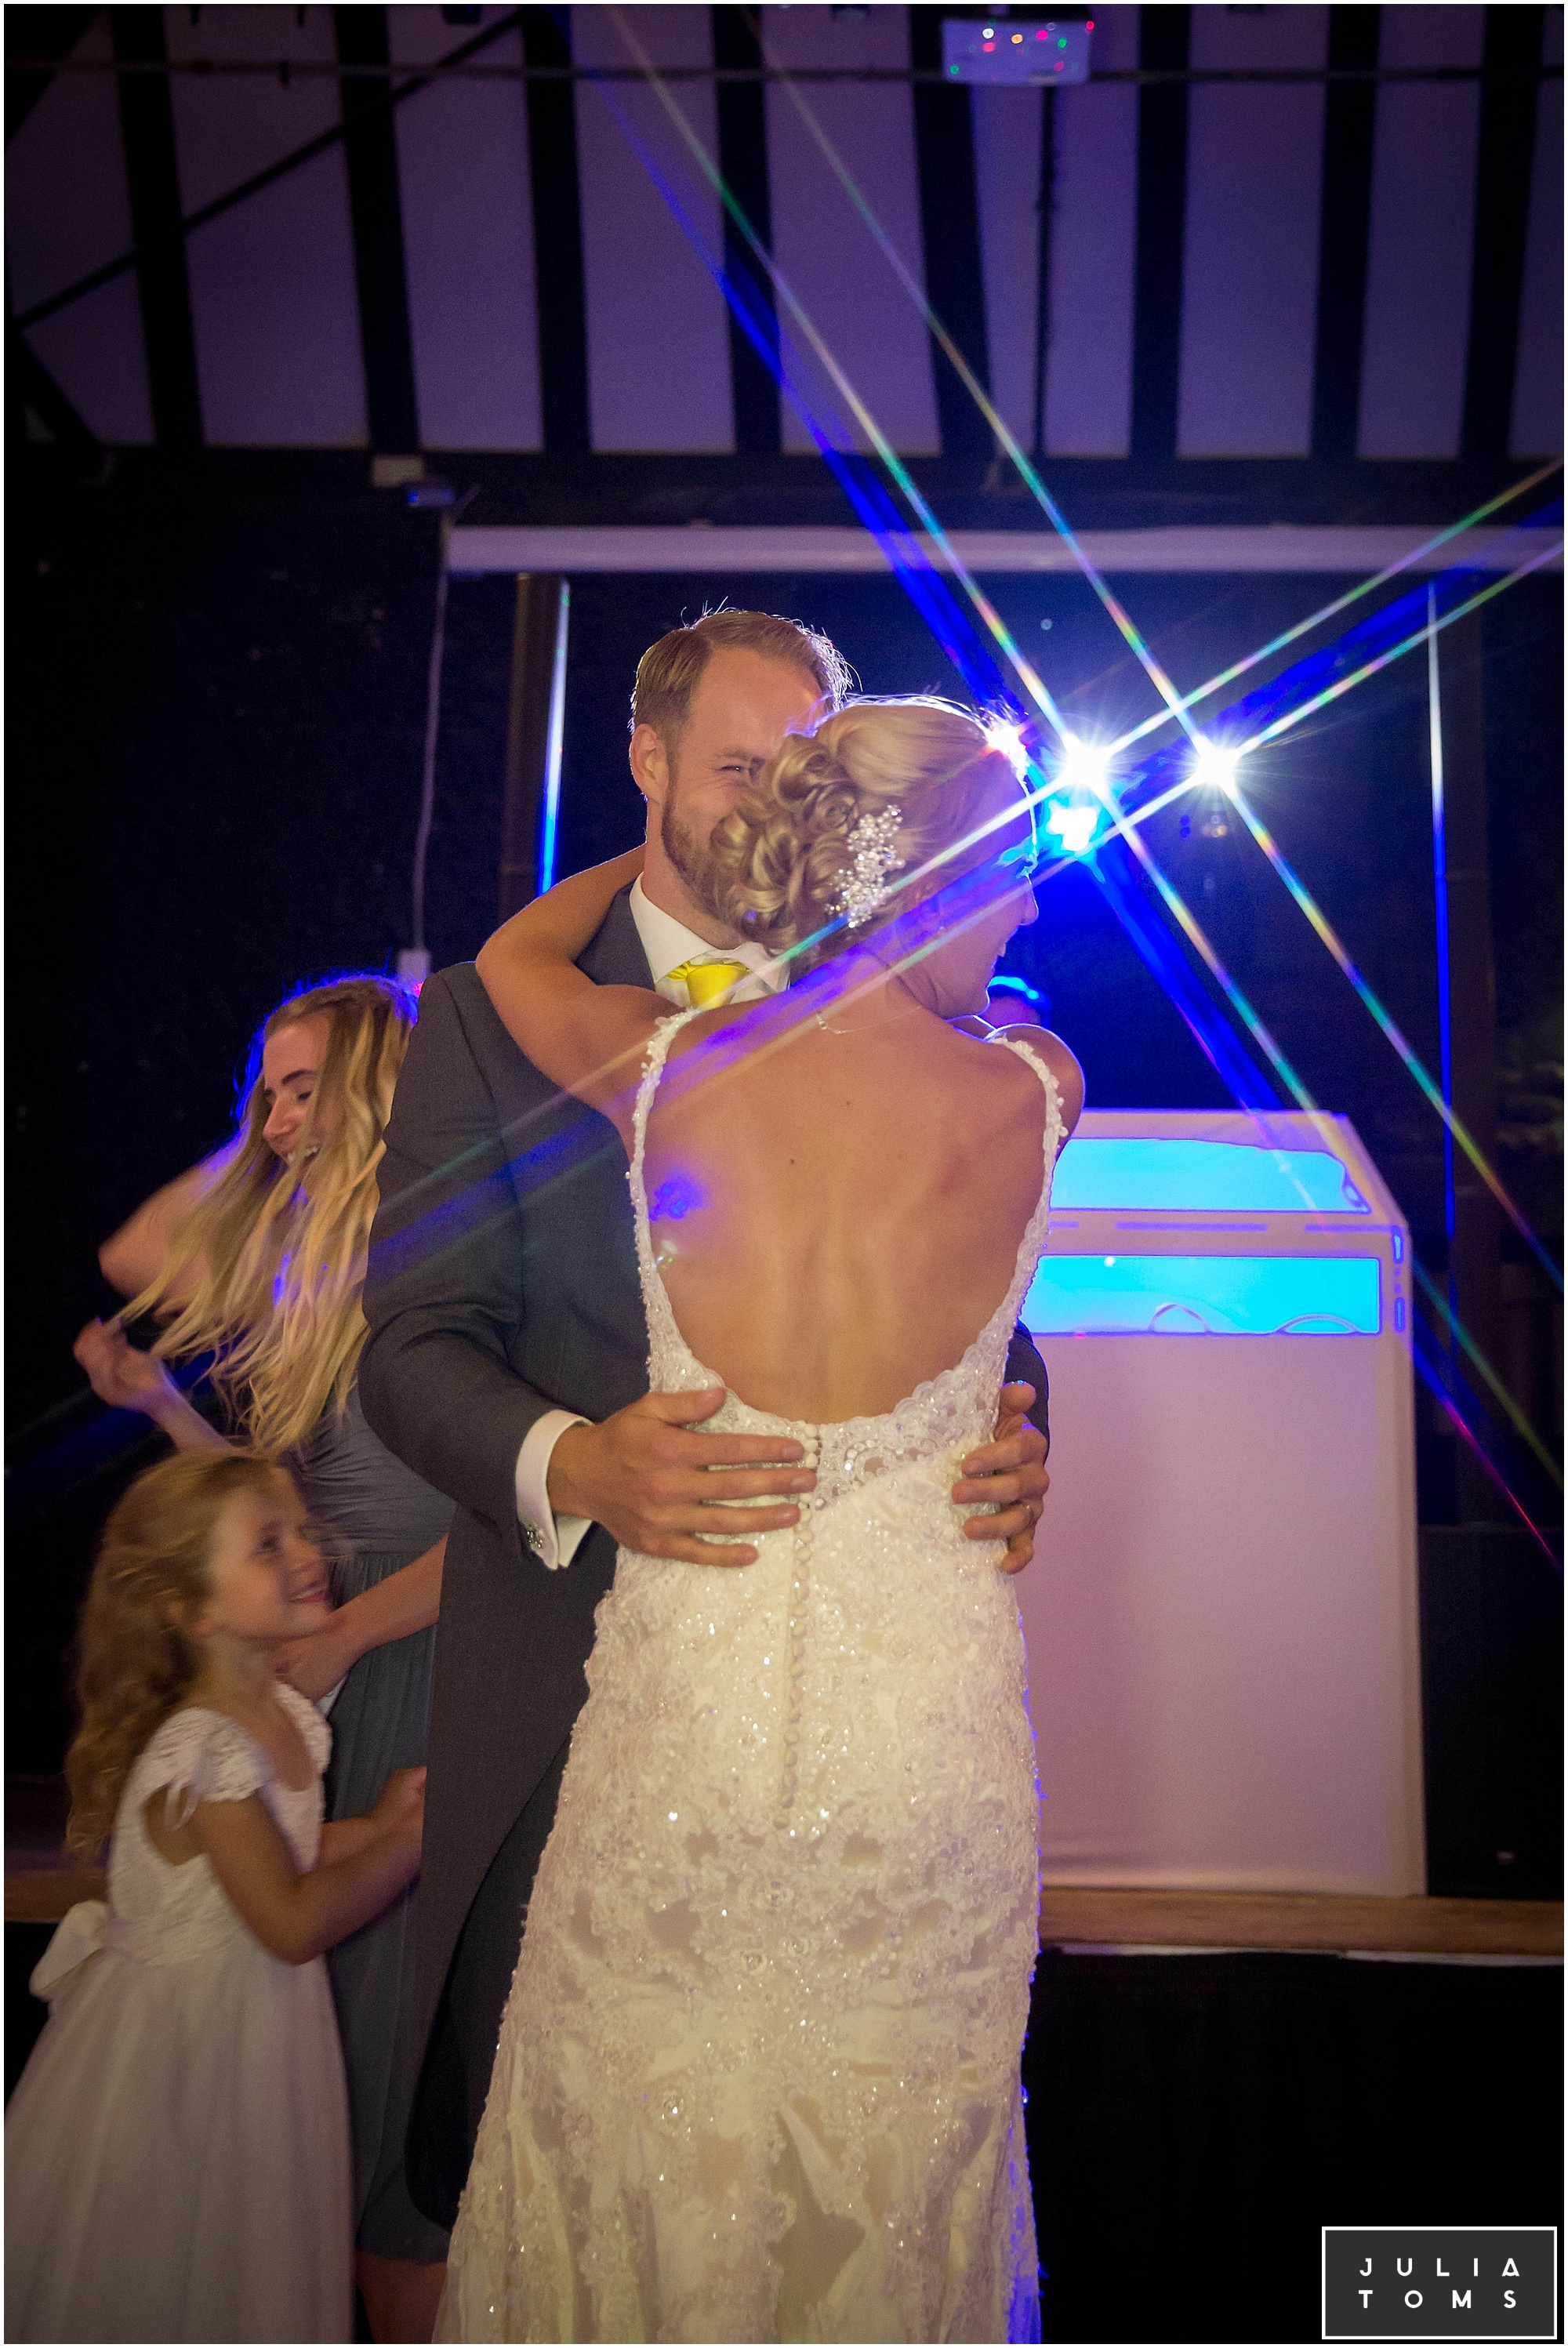 julia_toms_chichester_wedding_photographer_worthing_094.jpg